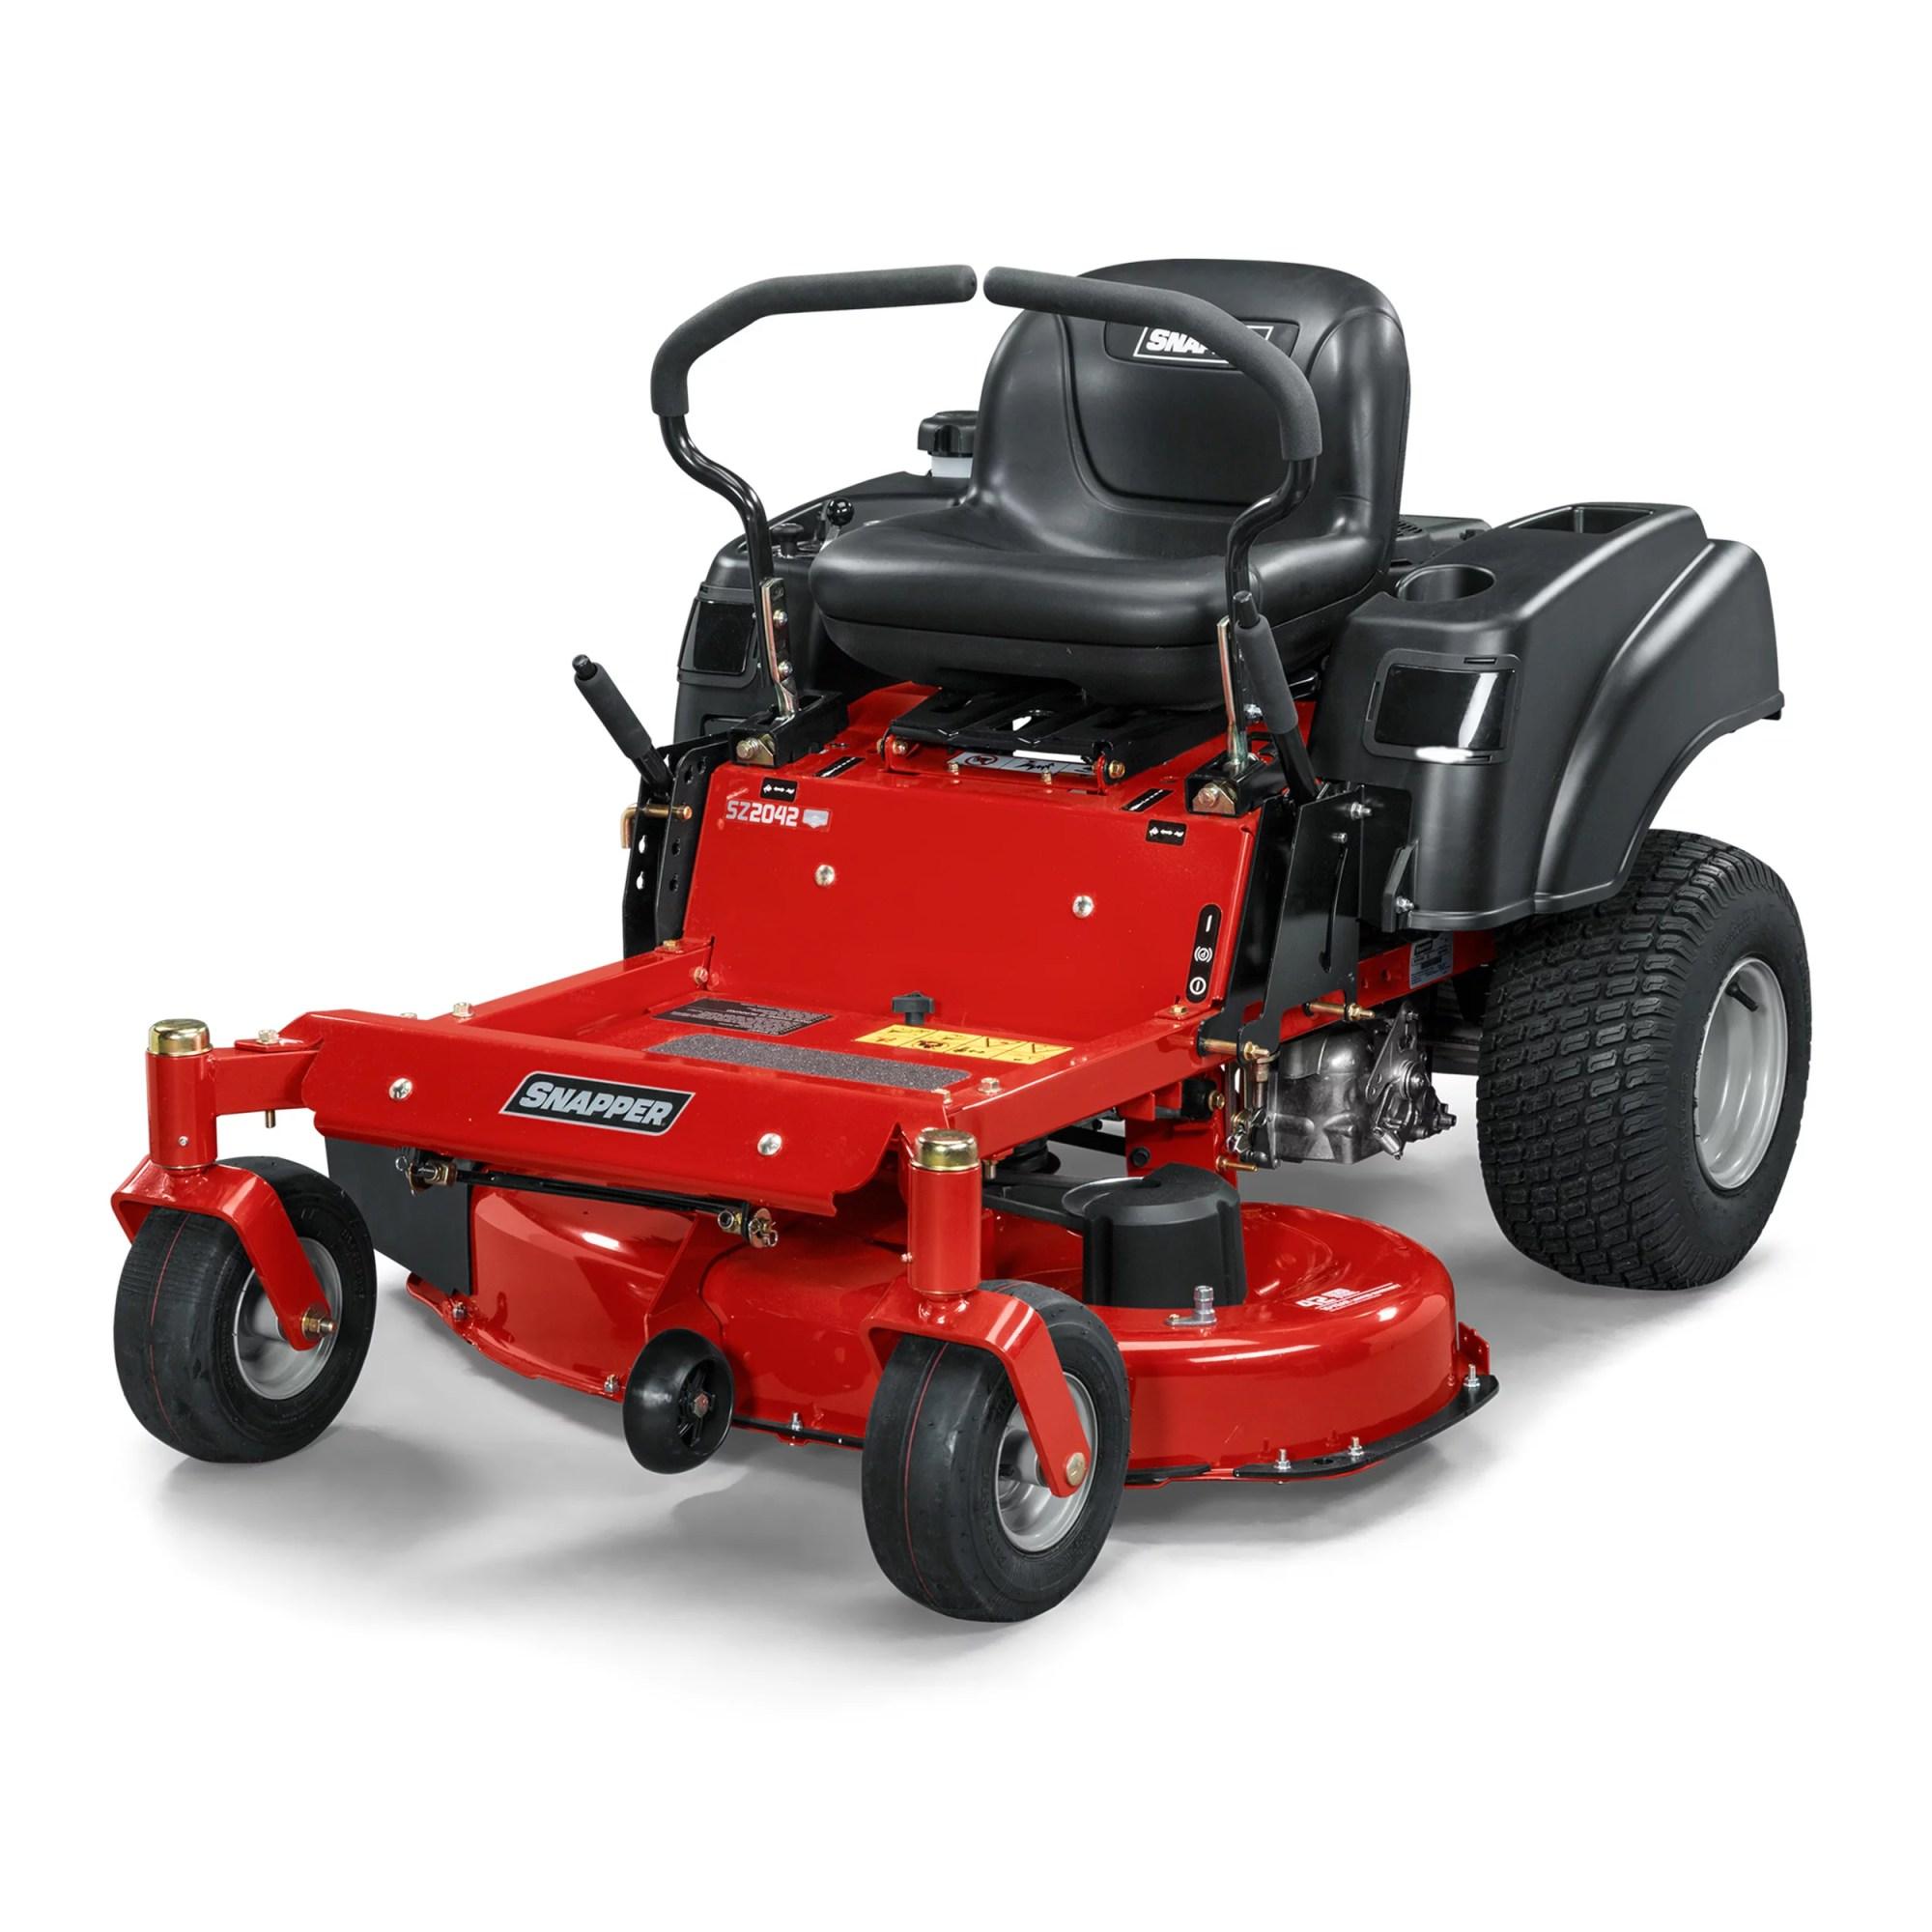 hight resolution of 20 hp briggs stratton hydrostatic zero turn mower walmart com